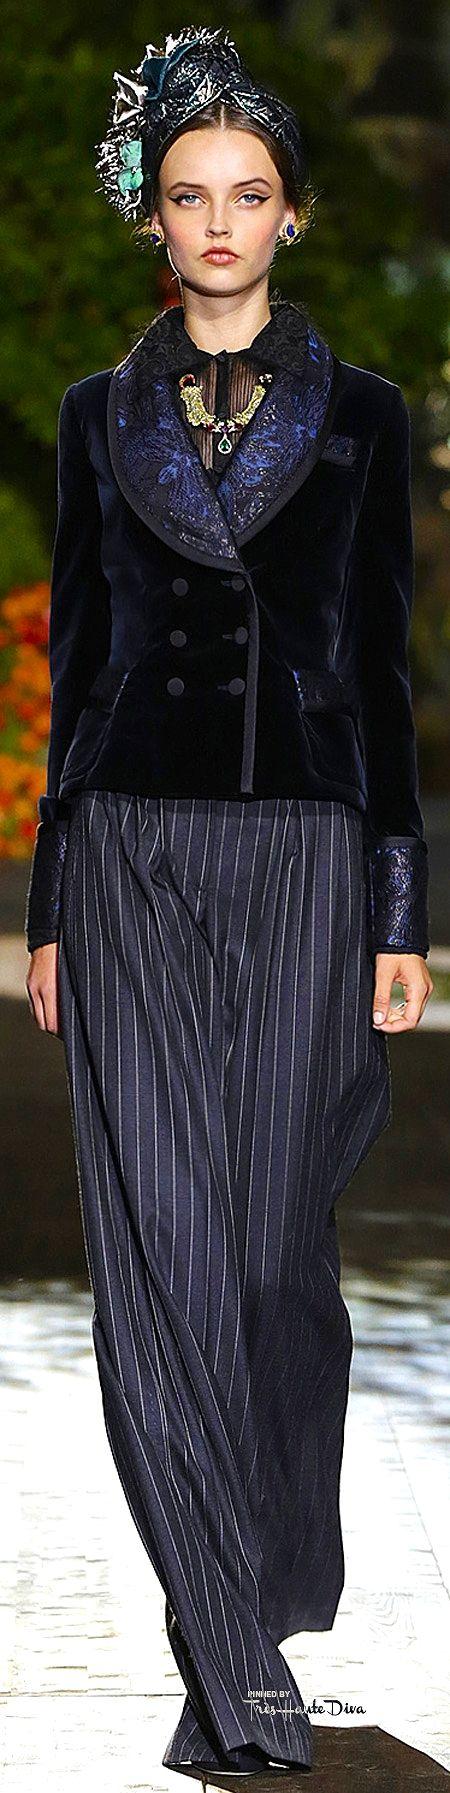 Dolce & Gabbana Alta Moda ~ Navy Embellished Velvet Short Jacket w Pin Striped Trousers,Fall 2015